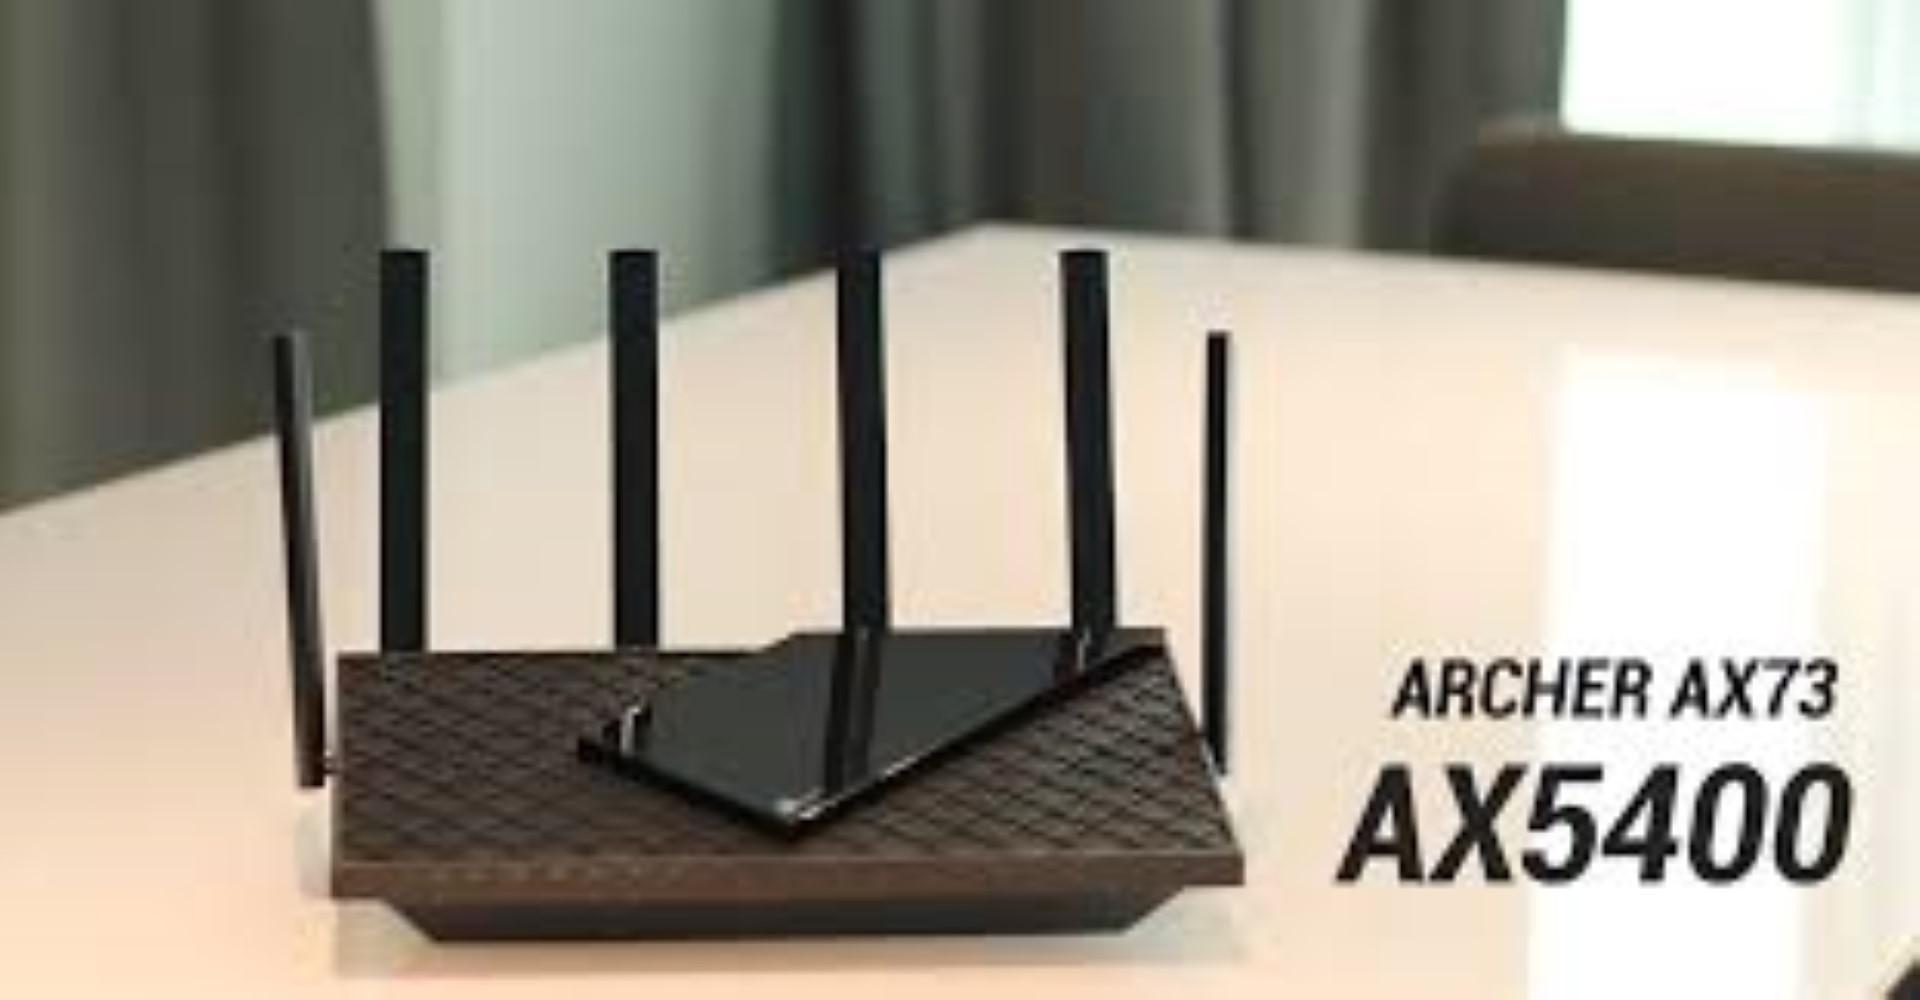 TP-LINK AX5400 Dual-Band Gigabit WI-FI6 Router, Standards: IEEE 802.11ax/ac/n/a 5 GHz, IEEE 802.11ax/n/b/g 2.4 GHz, 5 GHz: 4804 Mbps (802.11ax), 2.4 GHz: 574 Mbps (802.11ax), 6× Fixed High-Performance Antennas, 4×4 MU-MIMO, 1.5 GHz Triple-Core CPU, 1× Gigabit WAN Port, 4× Gigabit LAN Ports. - imaginea 2